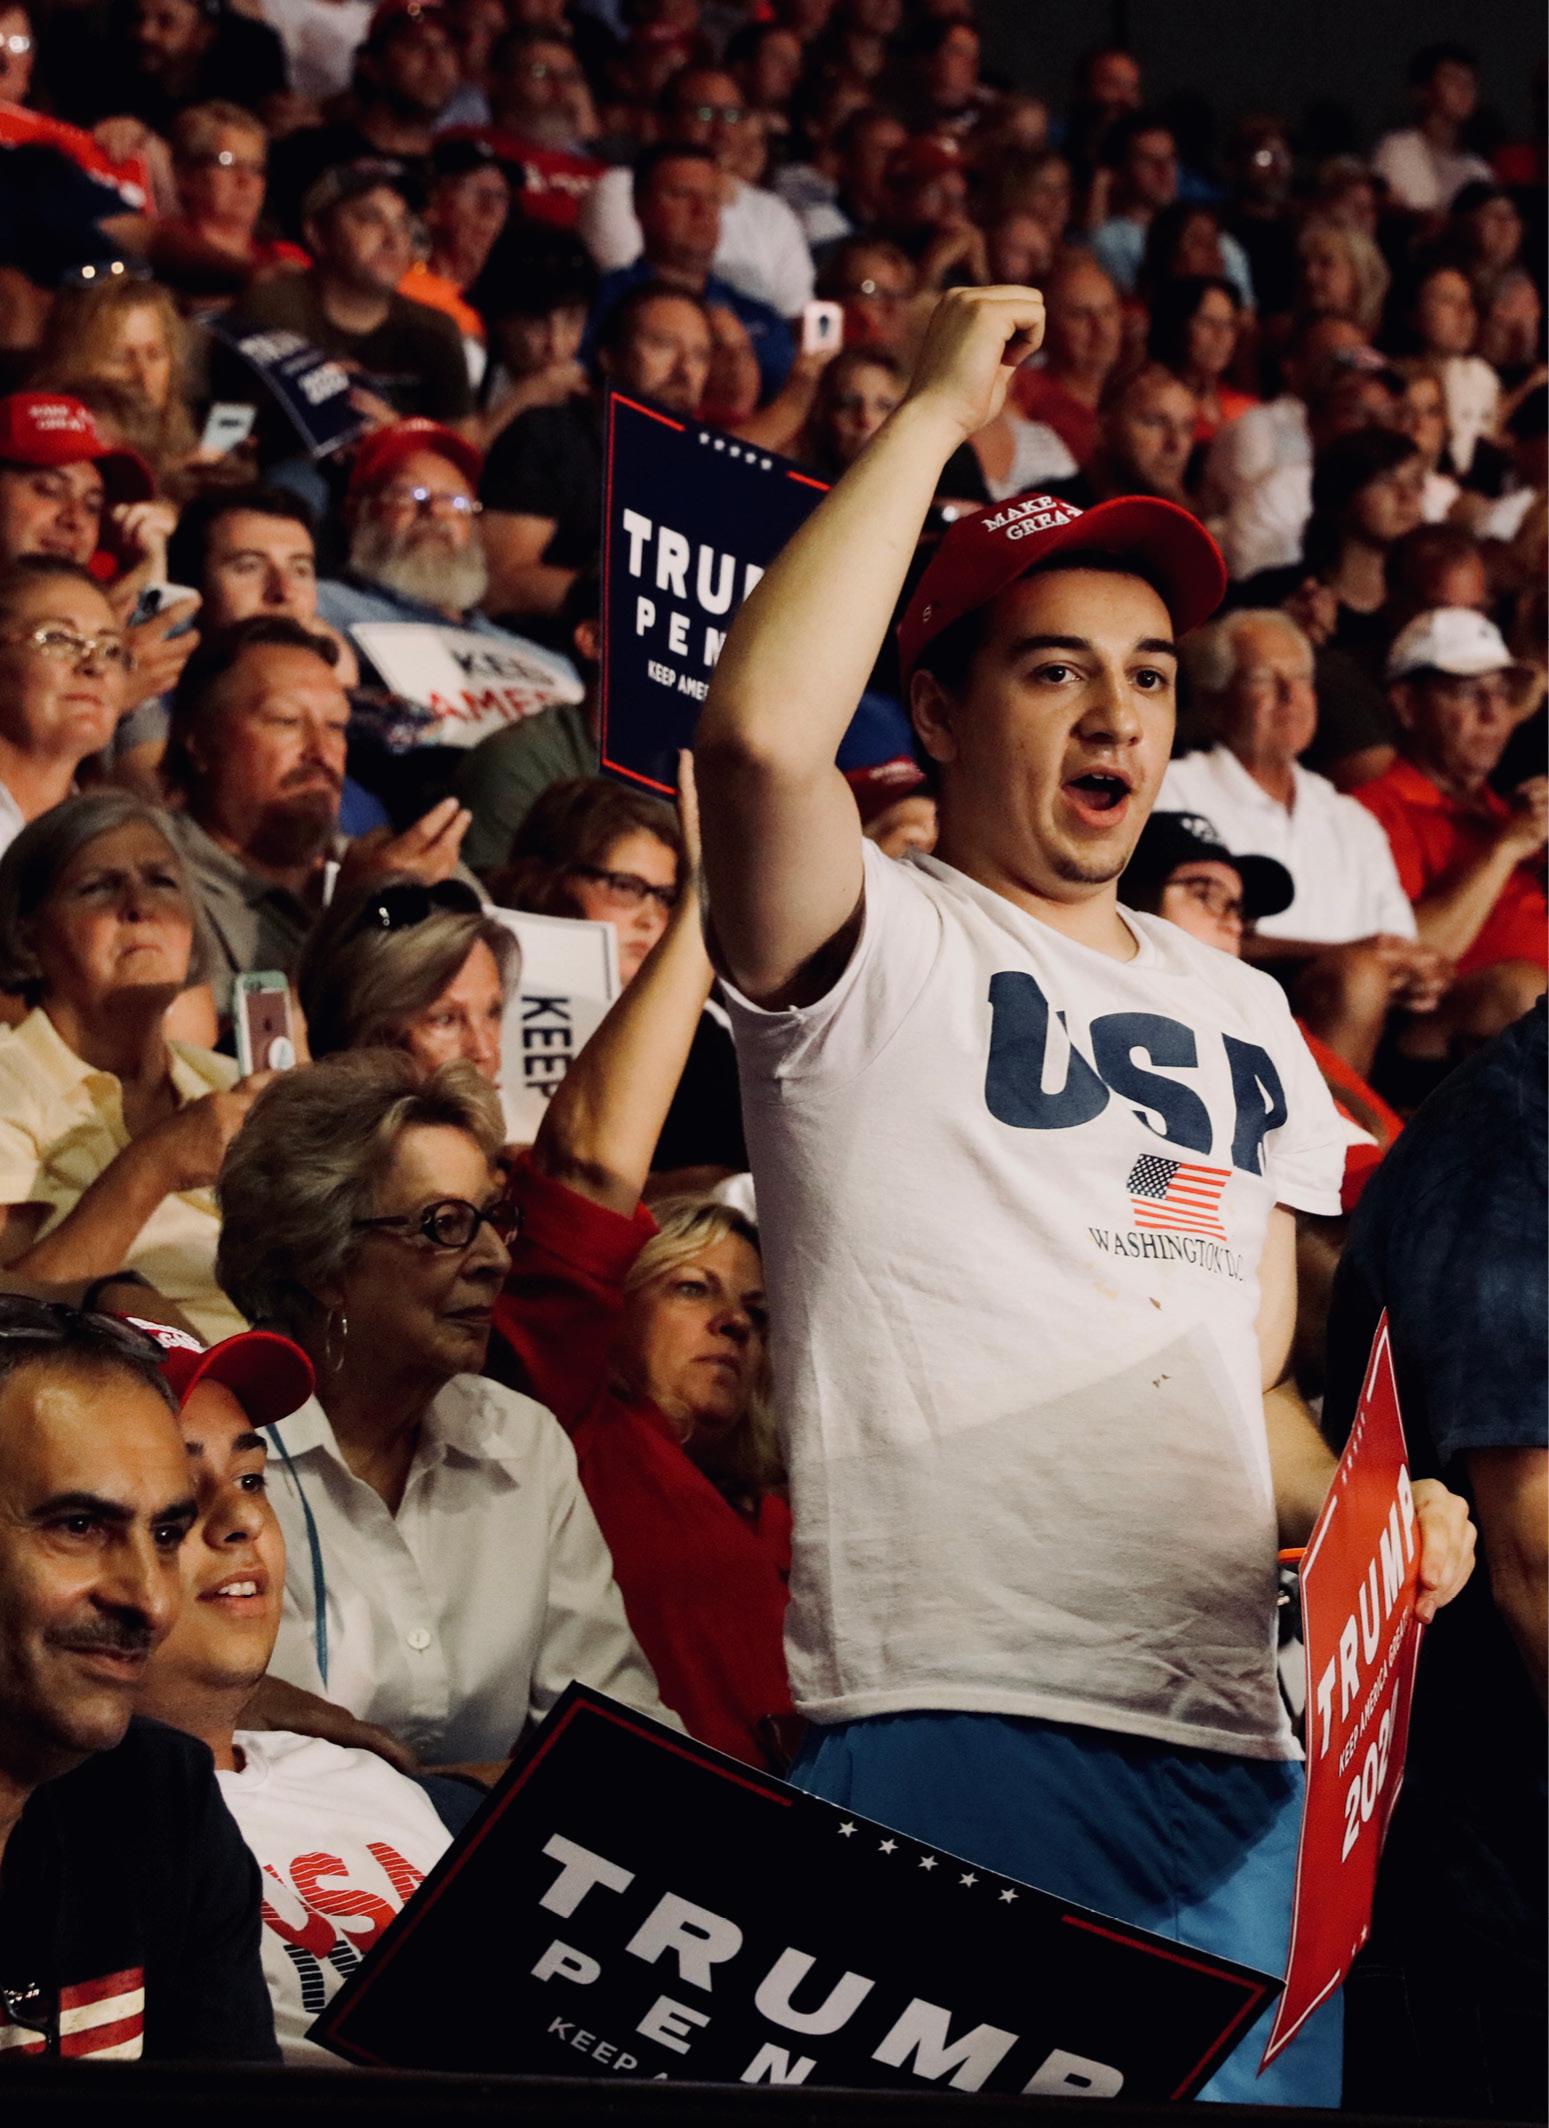 Andy Grant Trump Rally 8.1.19 - II24.jpg